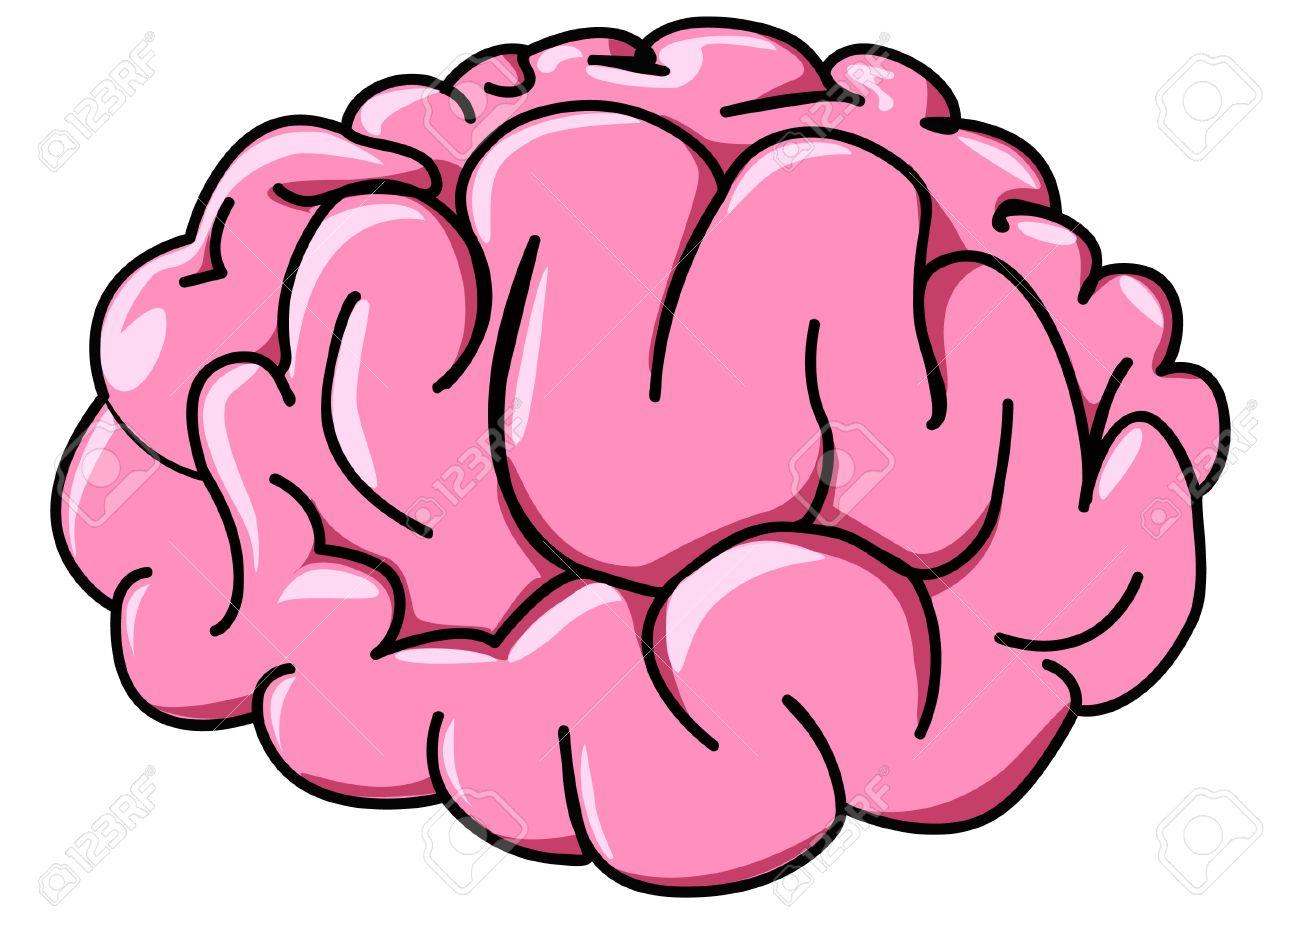 Cartoon brain clipart 6 » Clipart Station.